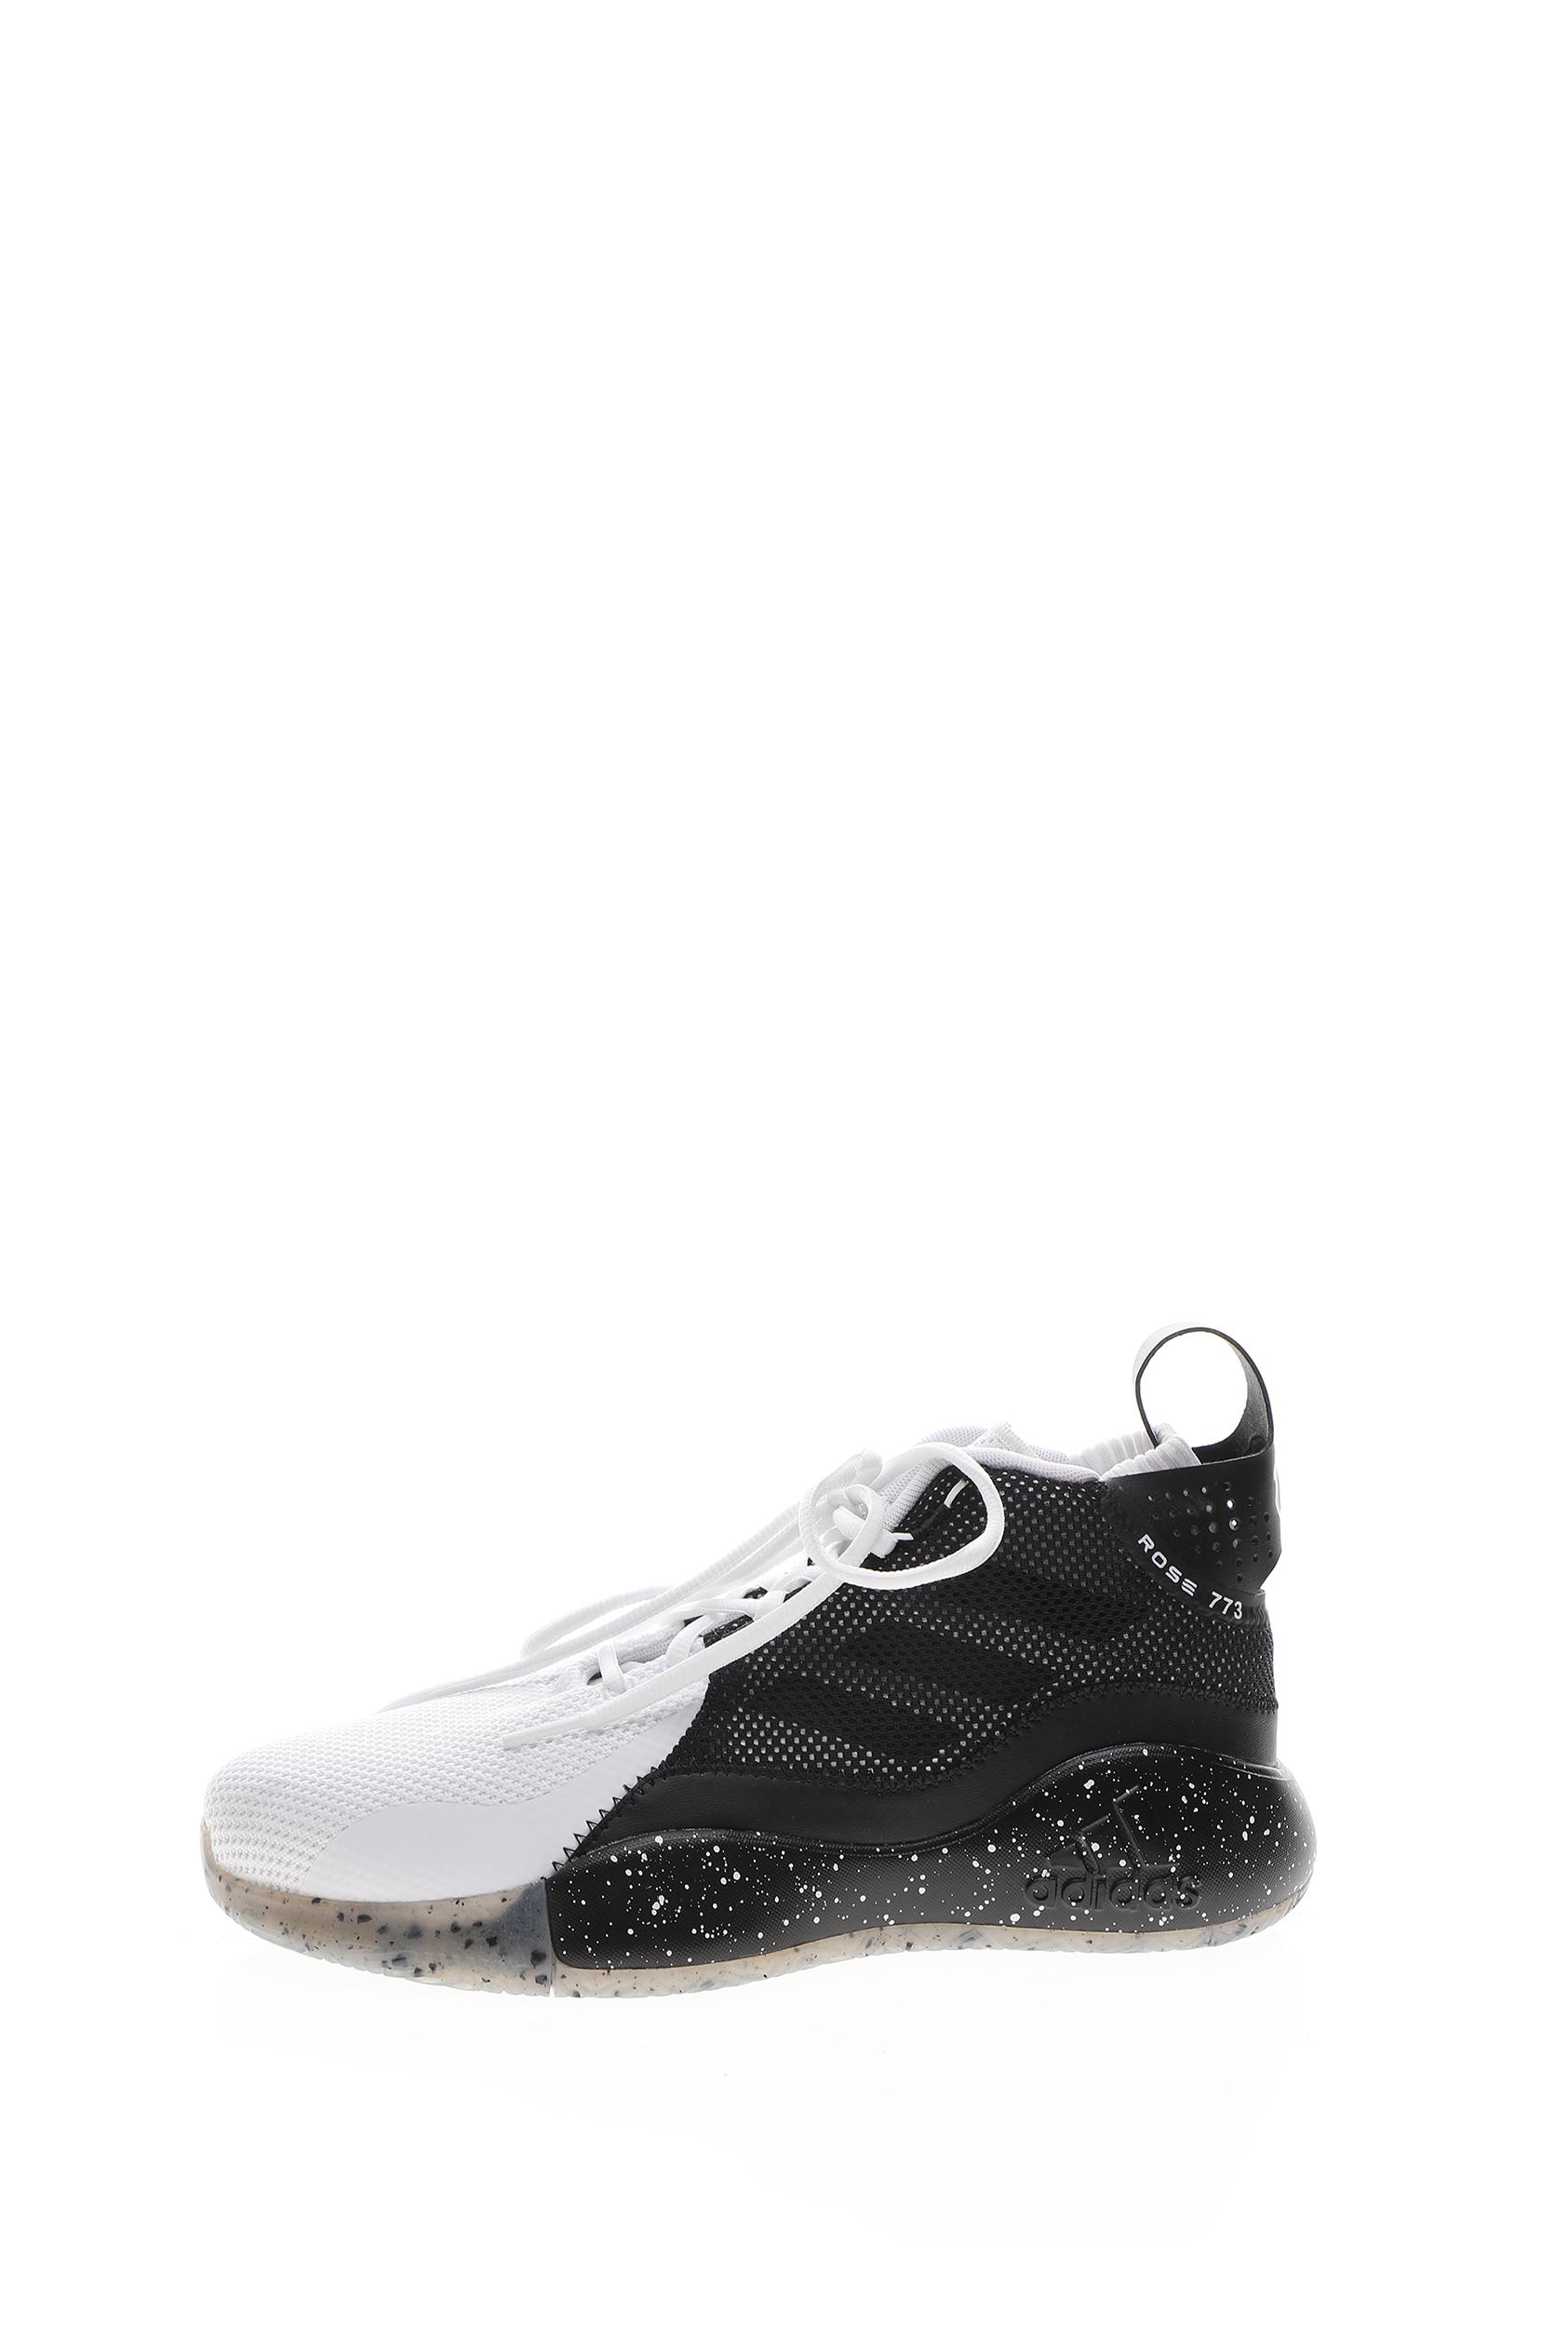 ADIDAS – Unisex παπούτσια μπάσκετ adidas D Rose Takedown λευκό-μαύρο